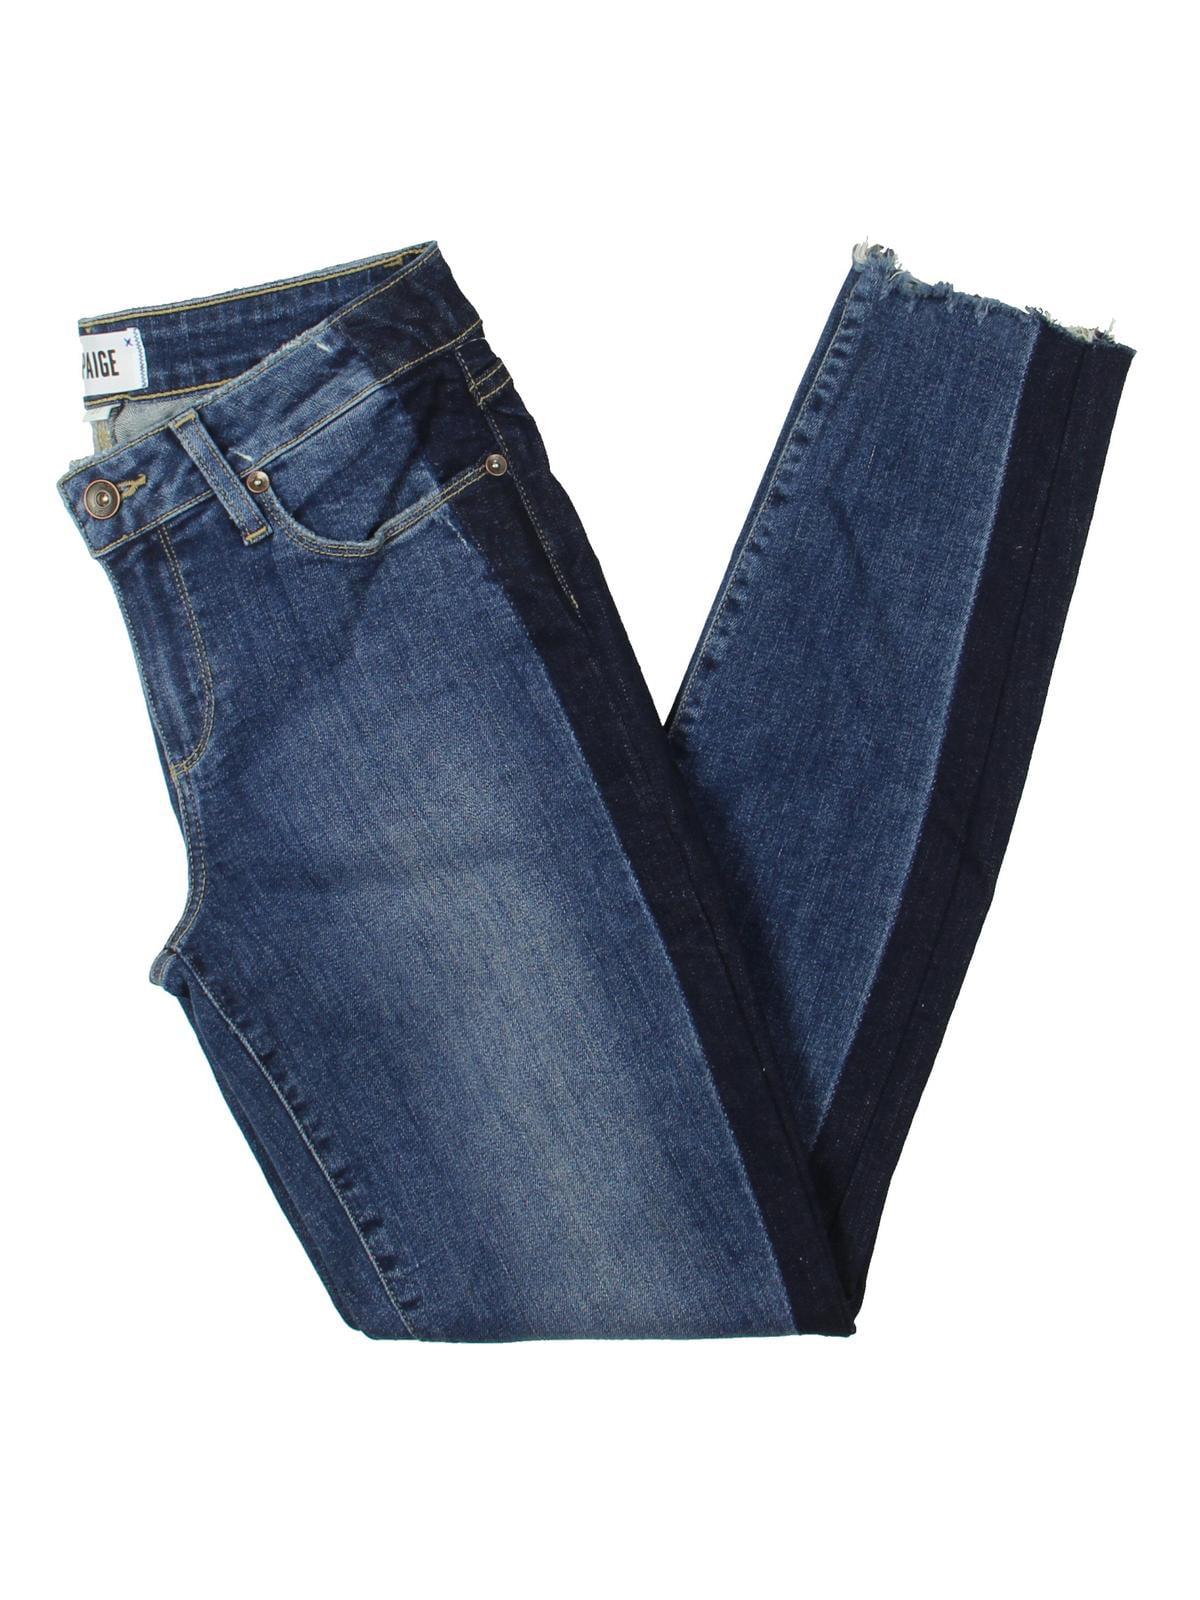 Paige Womens Stripe Distressed Skinny Jeans